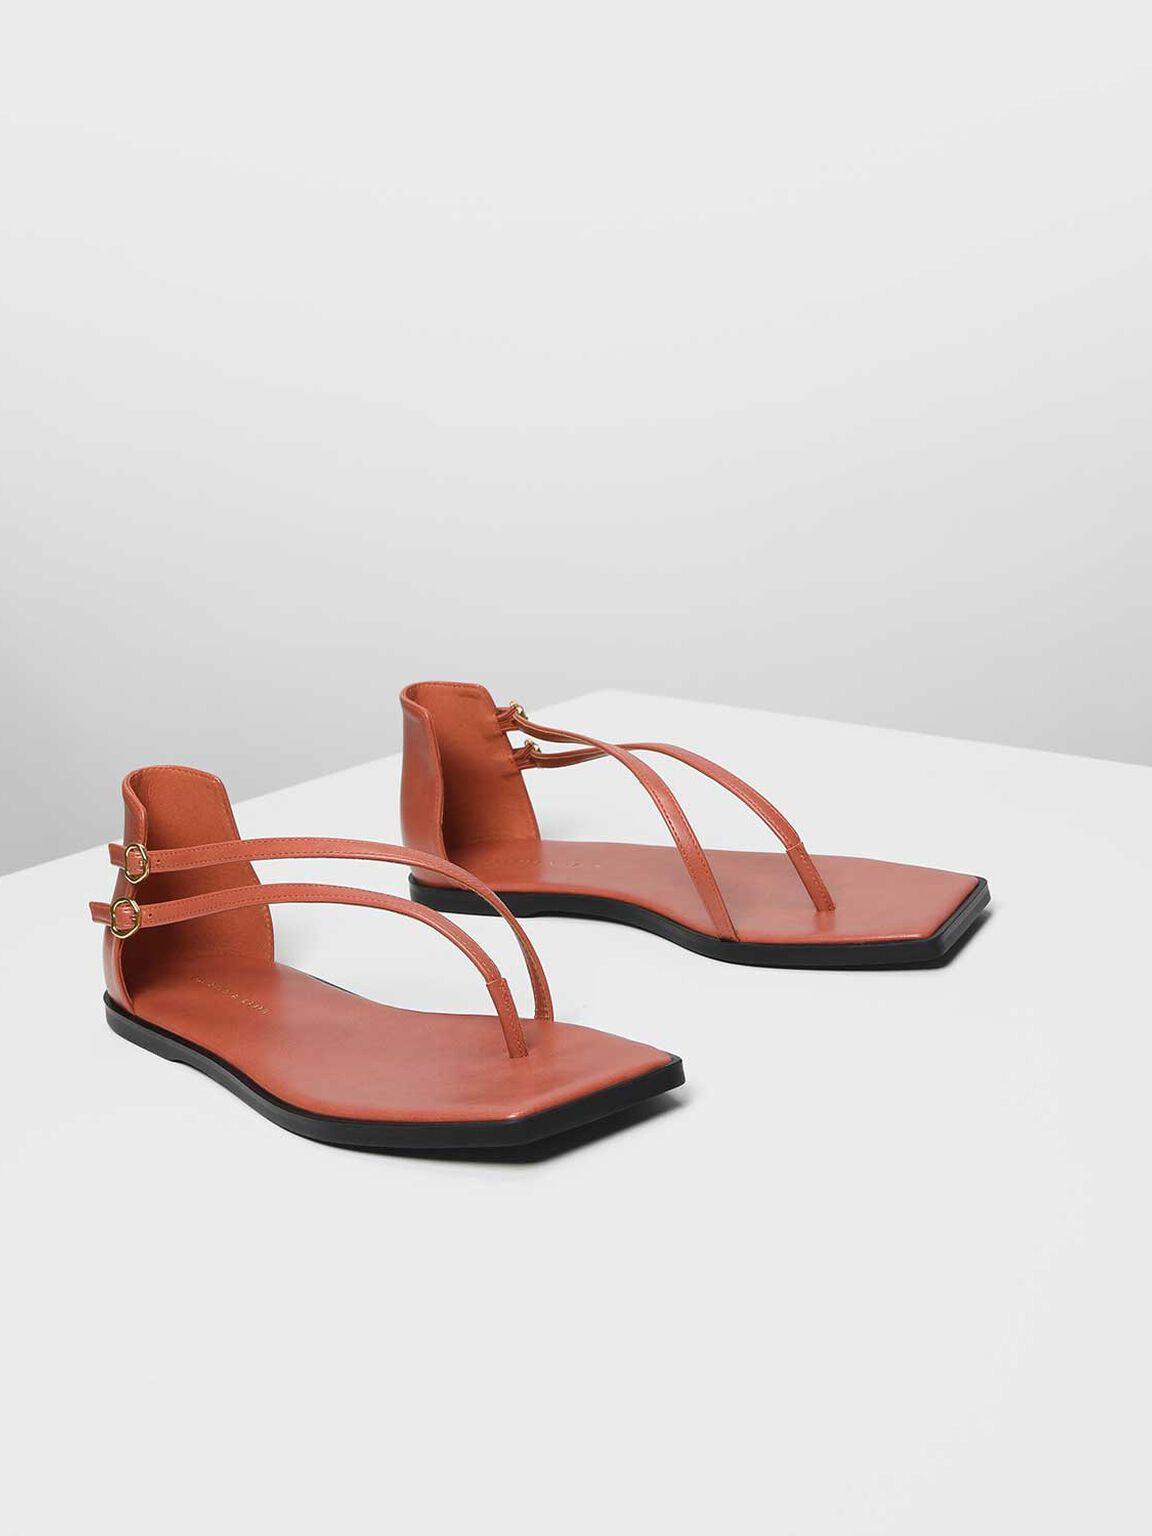 夾腳平底涼鞋, 橘色, hi-res